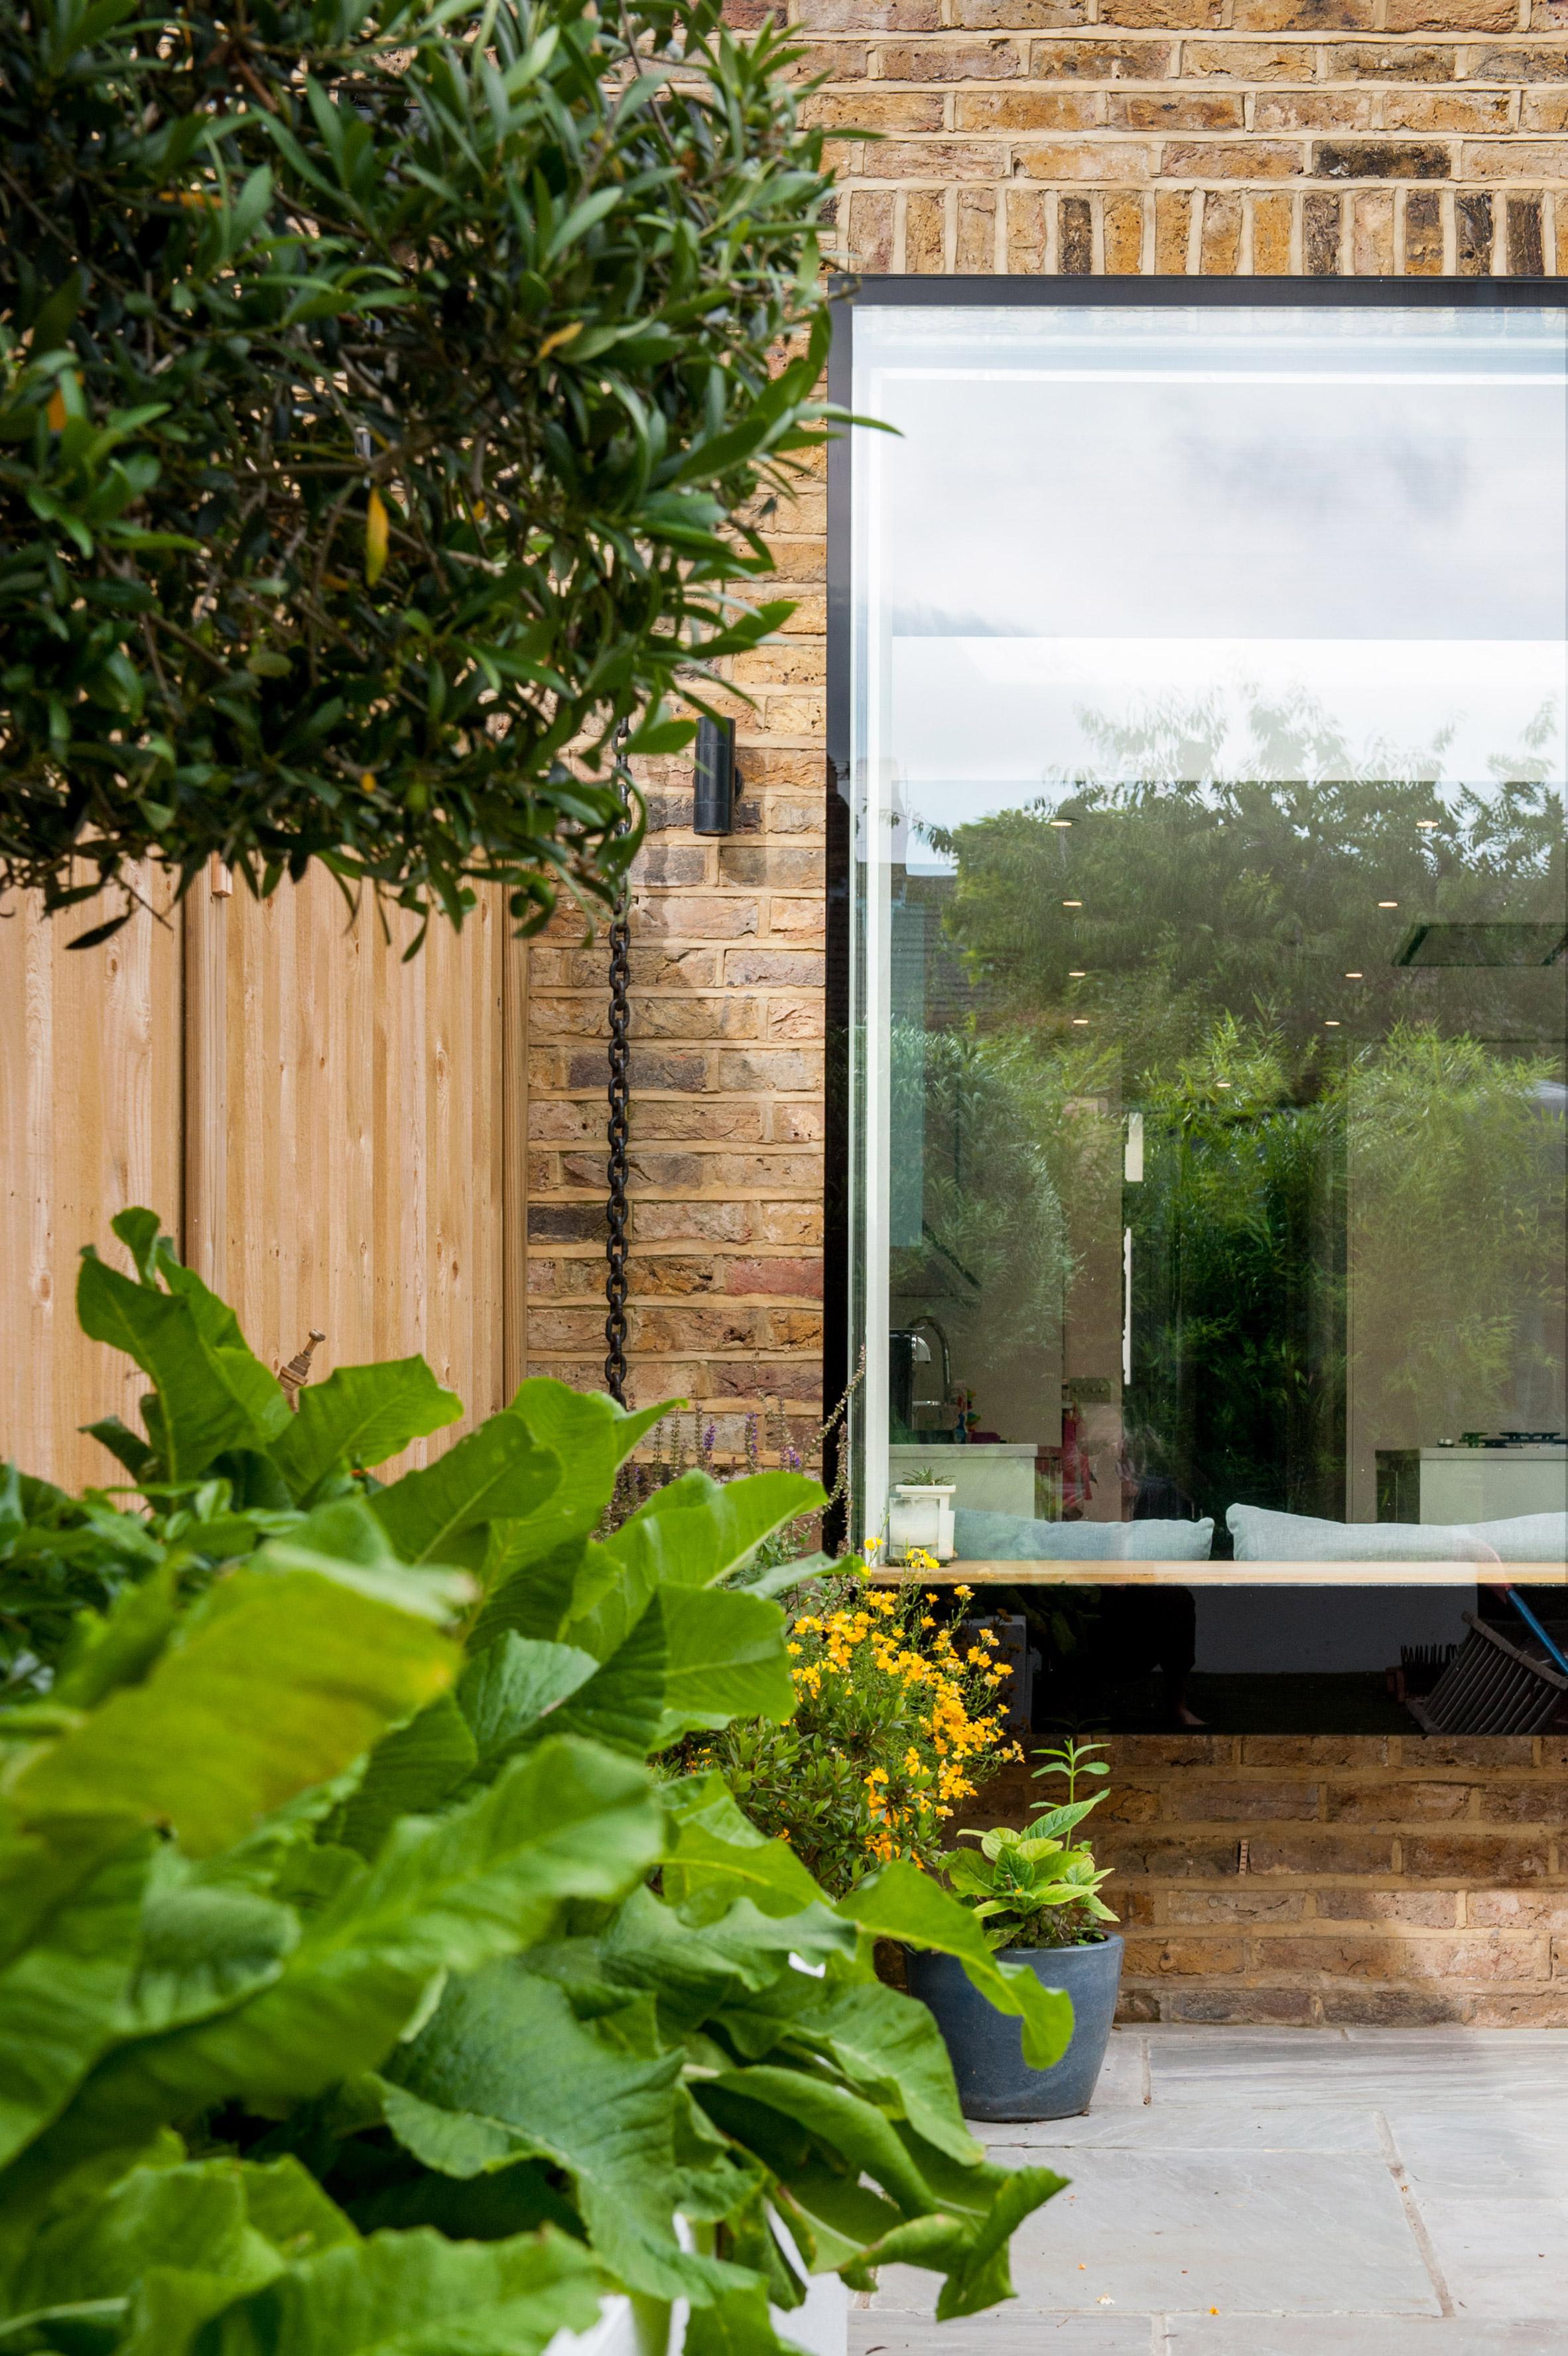 What's Hot on Pinterest- 5 Inspiring Modern Home Decor Ideas!